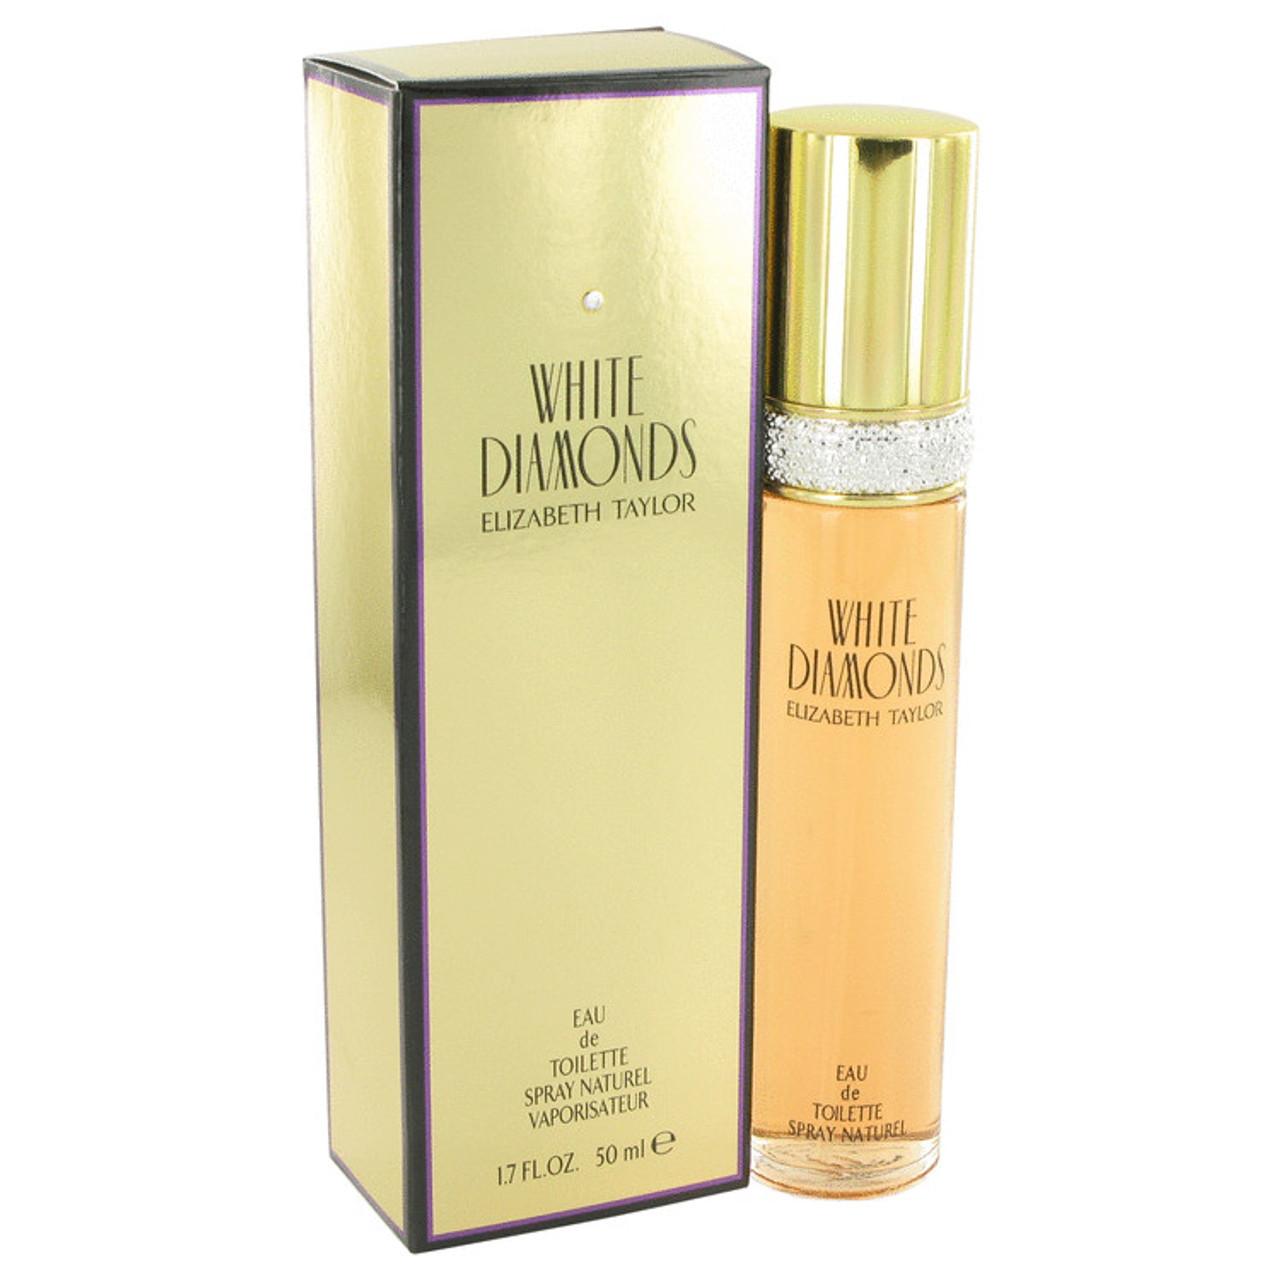 WHITE DIAMONDS by Elizabeth Taylor Eau De Toilette Spray 1.7 oz for Women - *Special Order